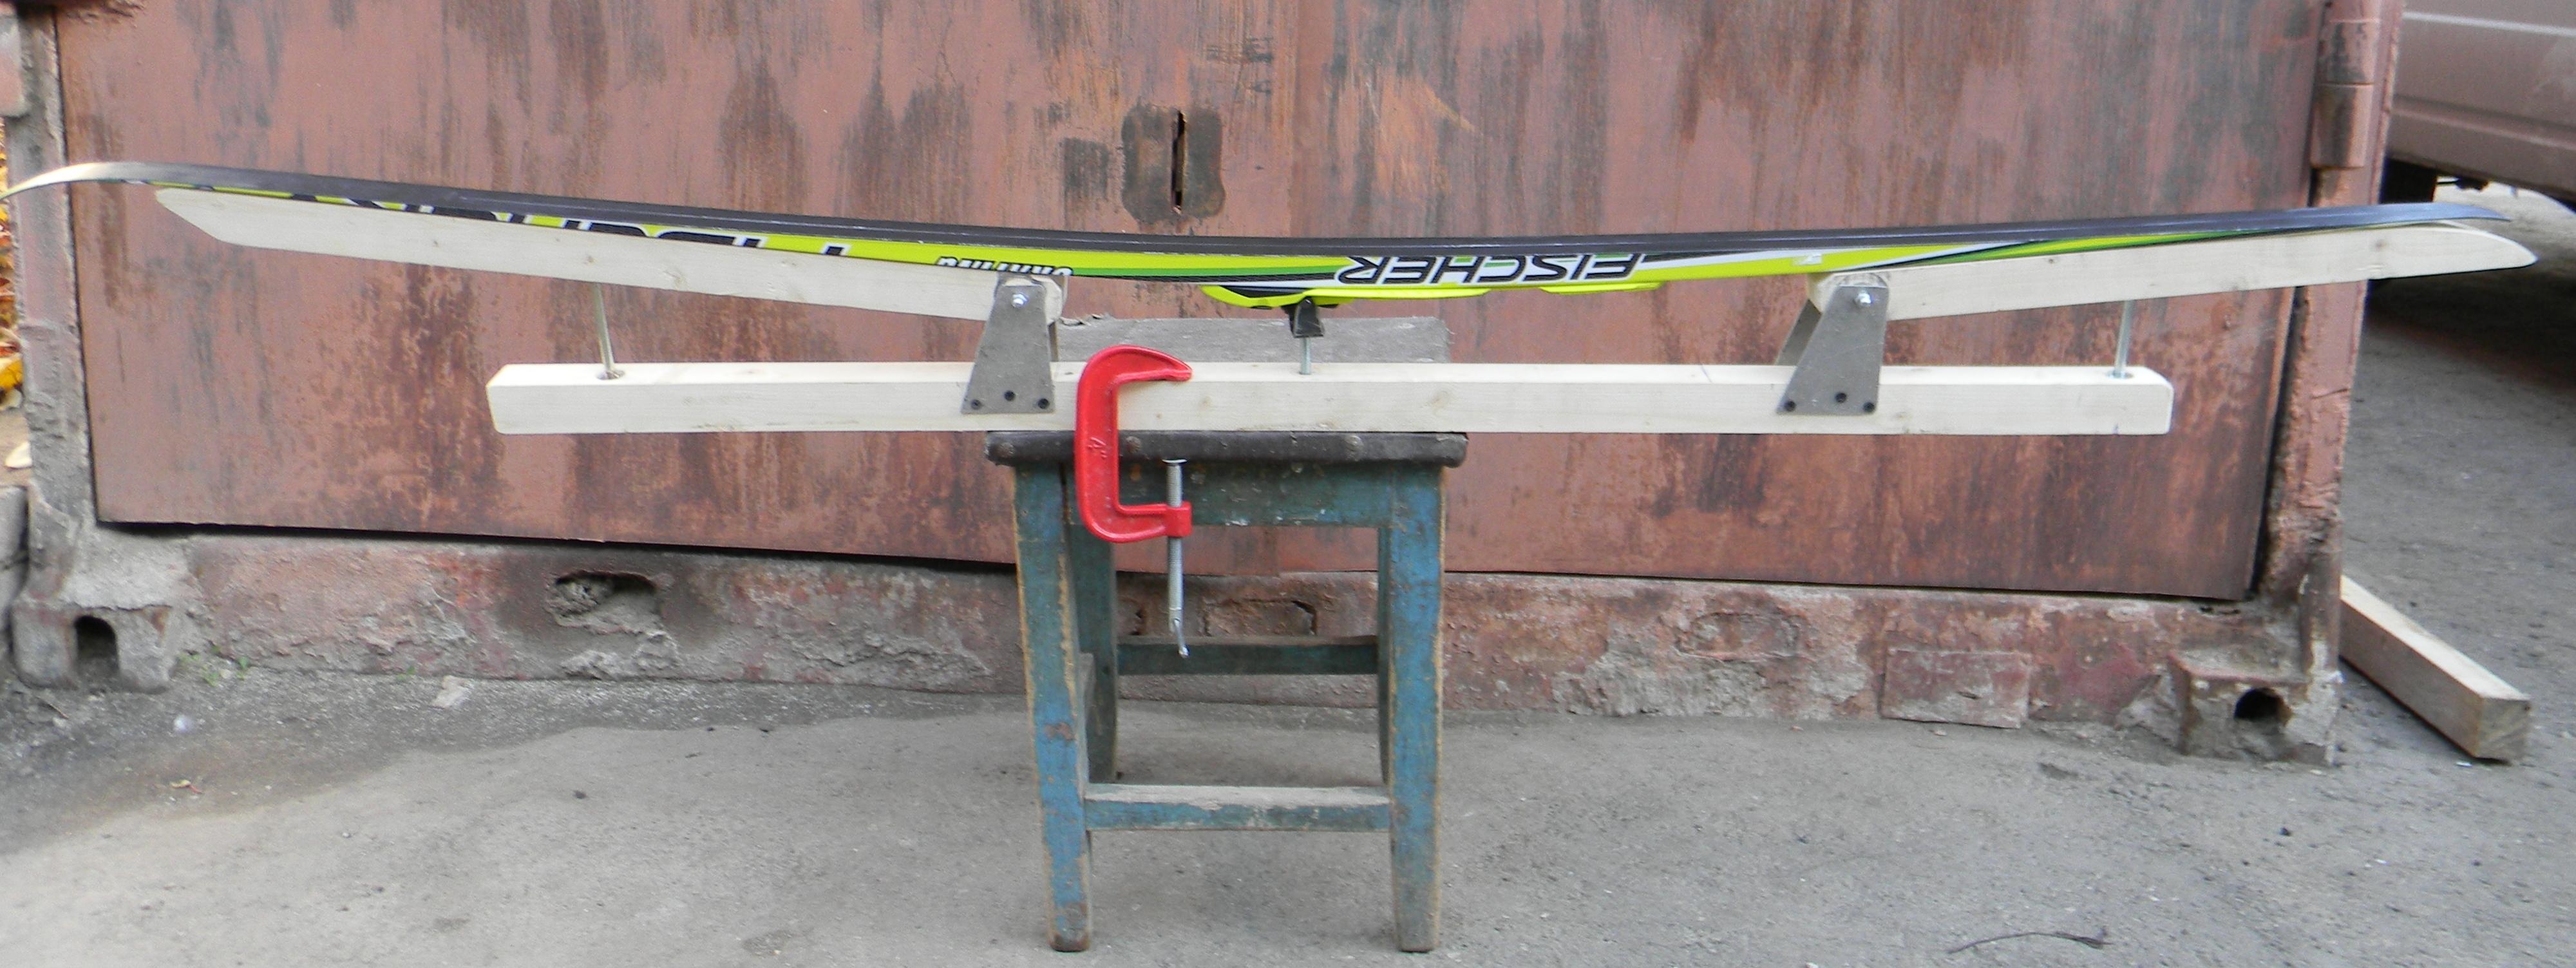 Чертеж станка для подготовки лыж своими руками